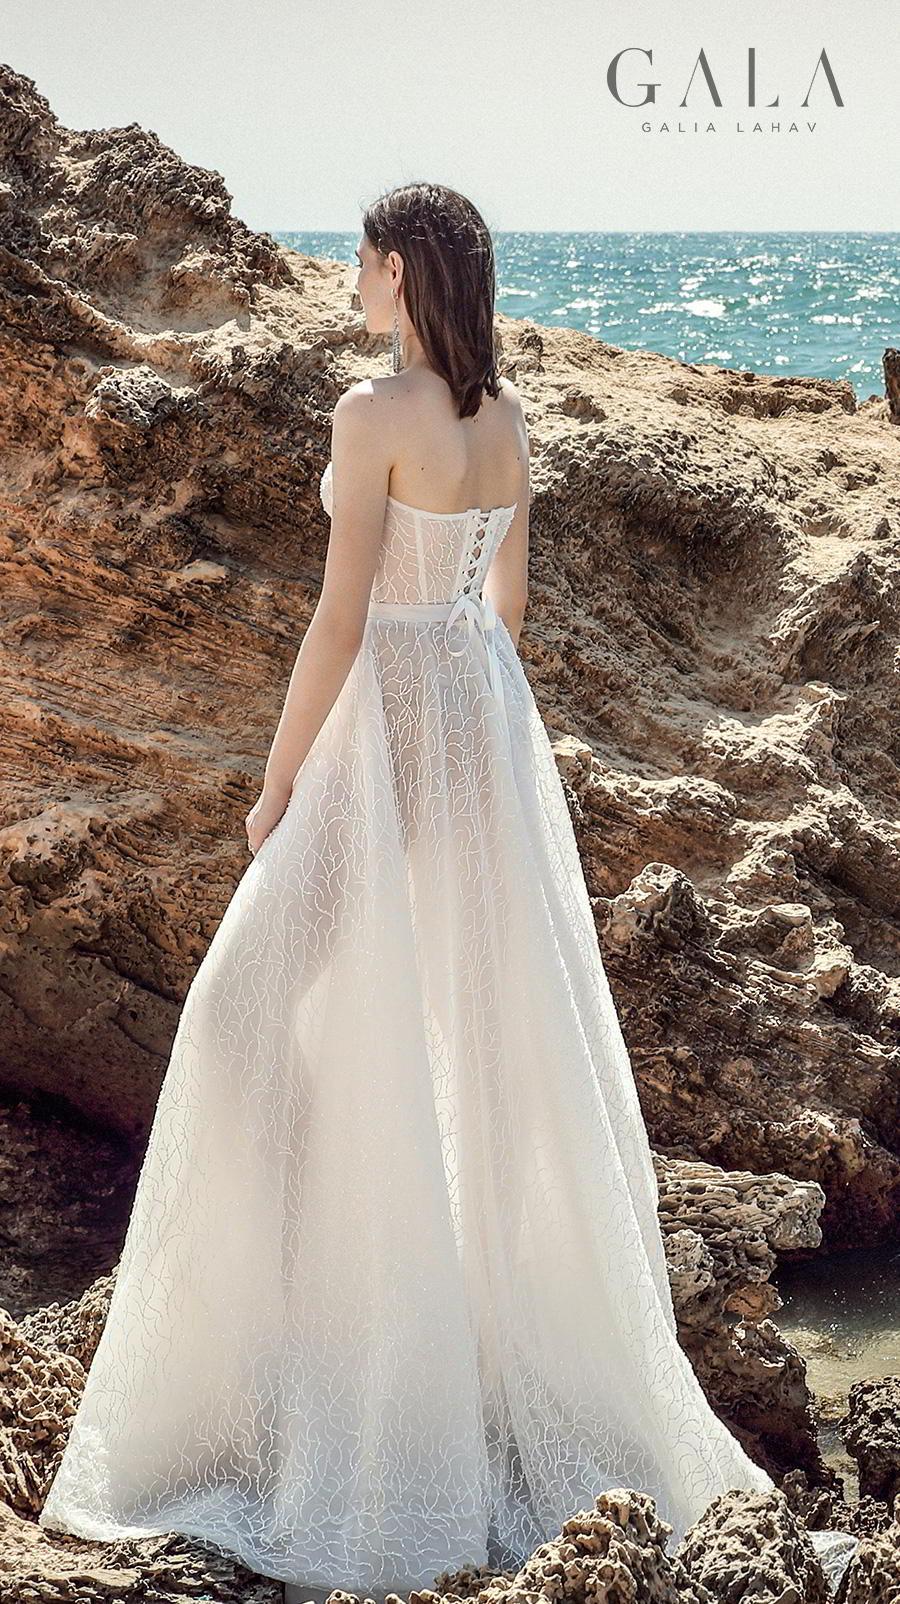 galia lahav fall 2020 gala no 9 bridal strapless deep sweetheart neckline full embellishment romantic a  line wedding dress mid back sweep train (412) bv